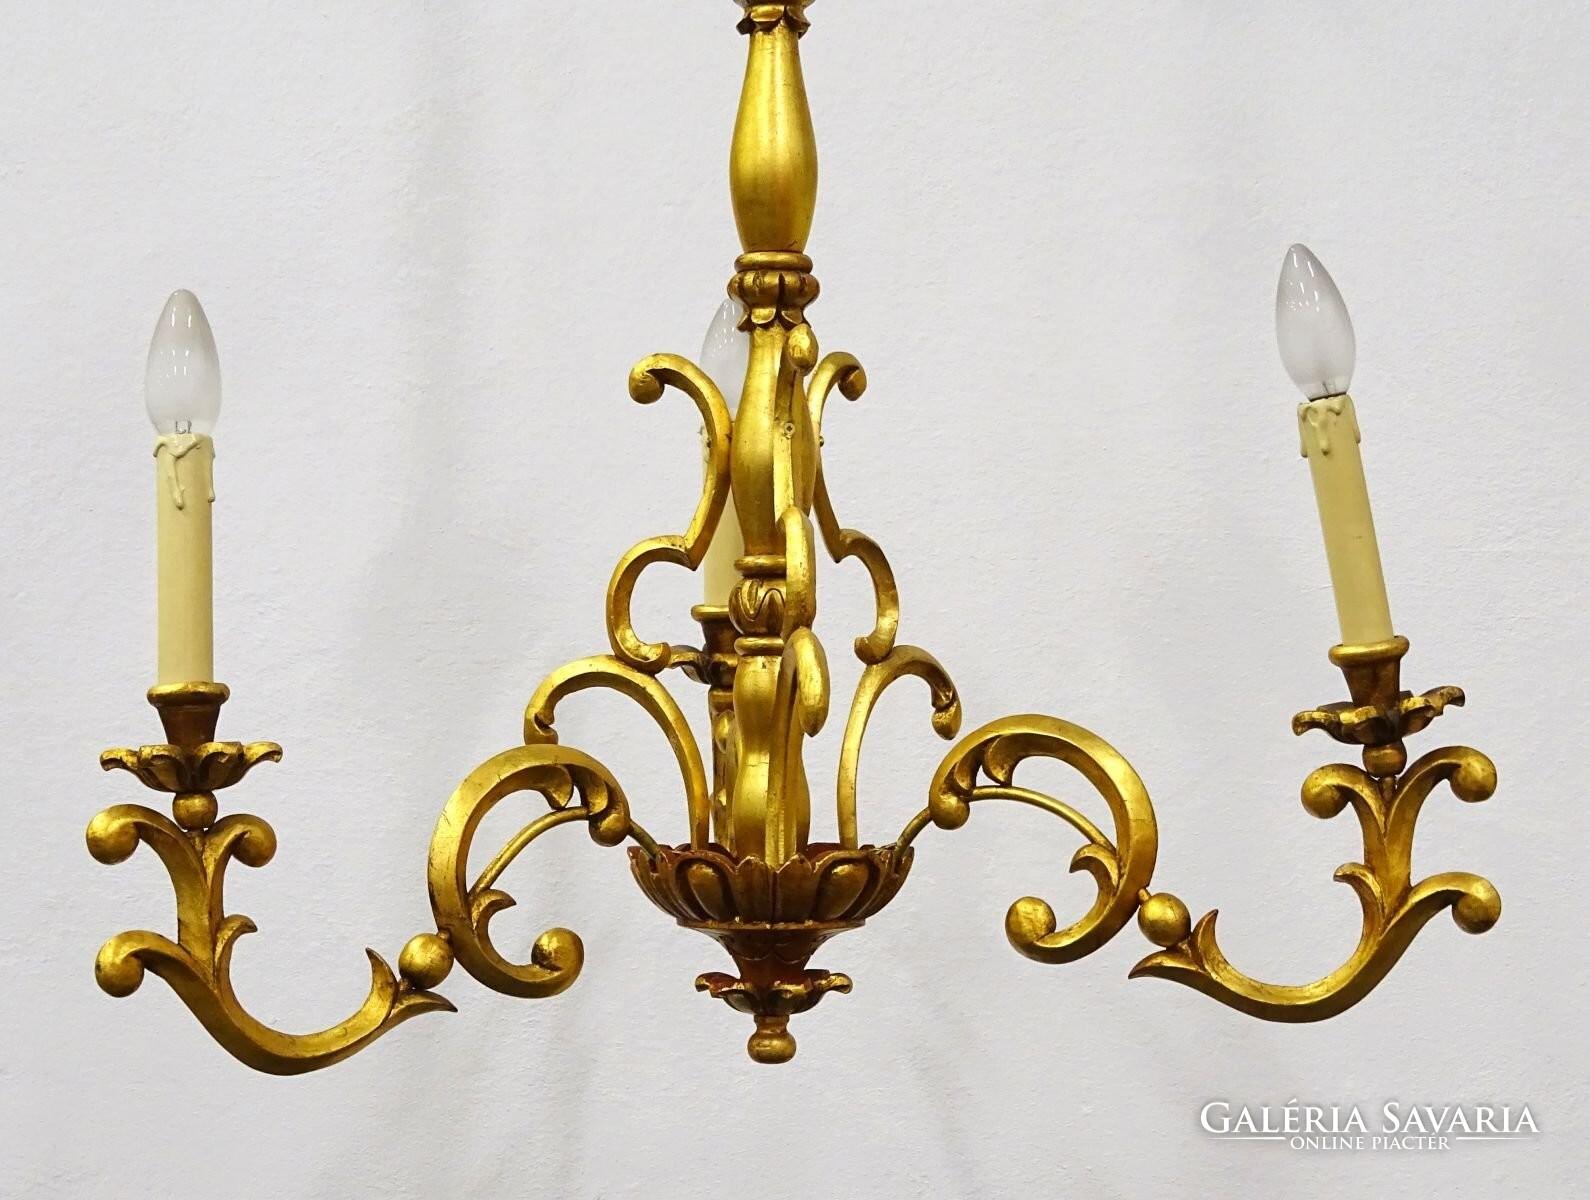 Antik fa csillár Lámpa, csillár   Galéria Savaria online piactér